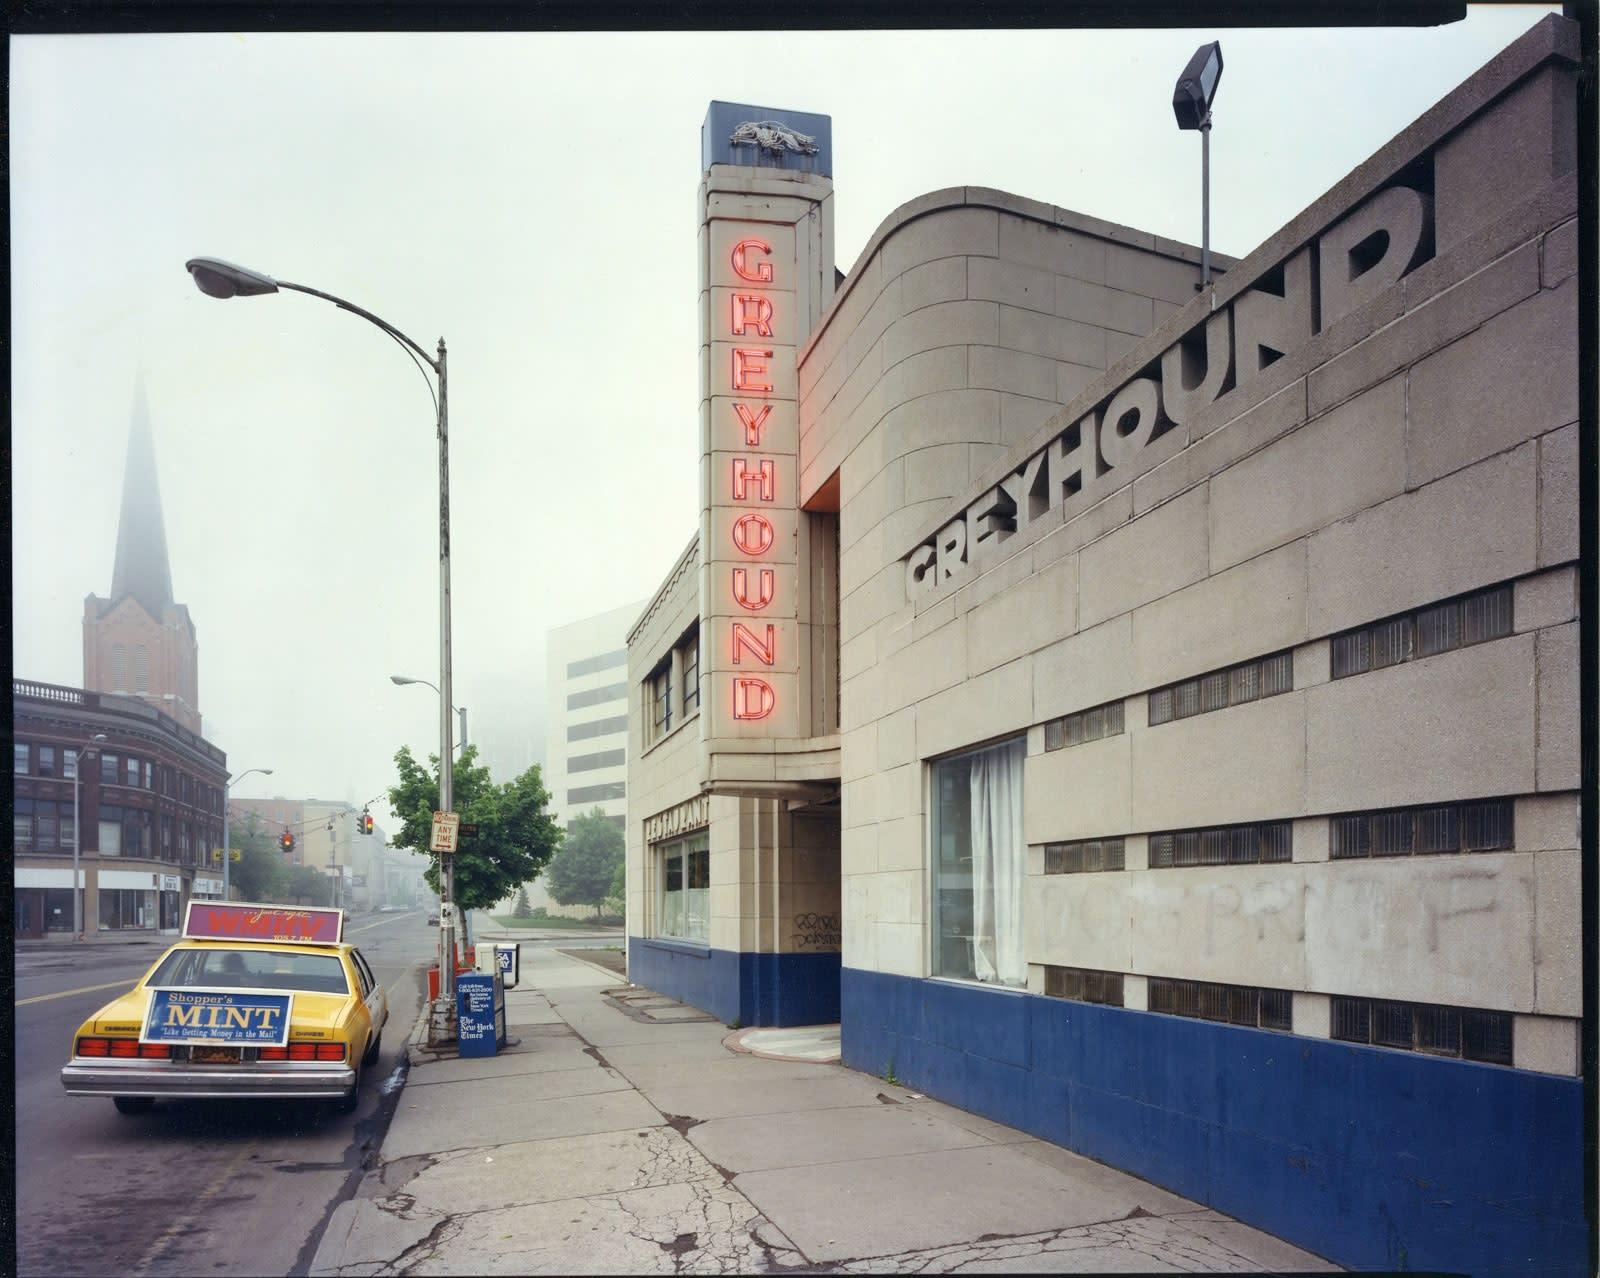 Bruce Wrighton, Greyhound Bus Station, Binghamton, NY, 1986